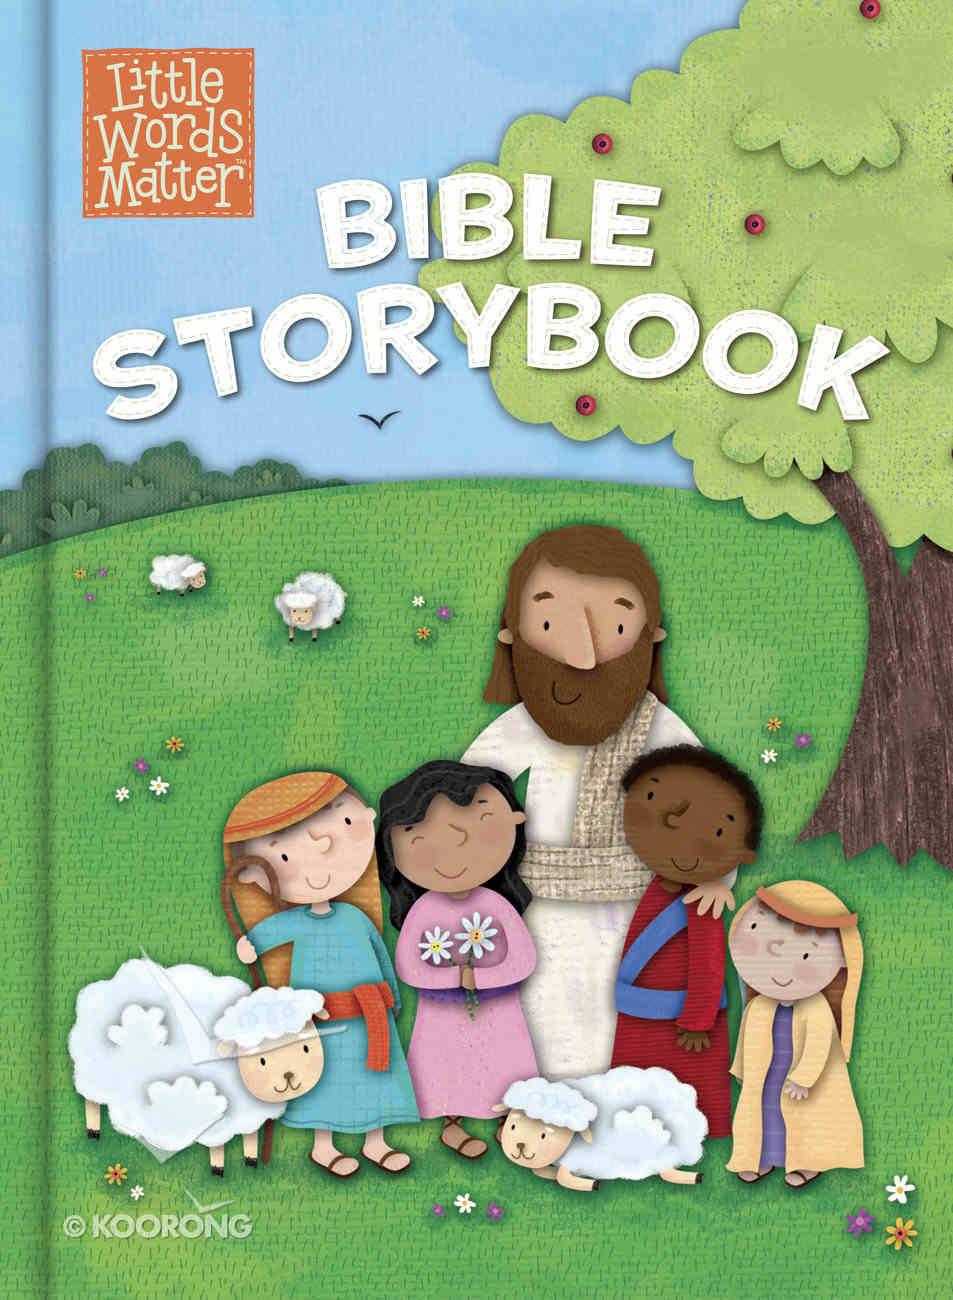 Little Words Matter Bible Storybook (Padded Board Book) (Little Words Matter Series) Padded Board Book